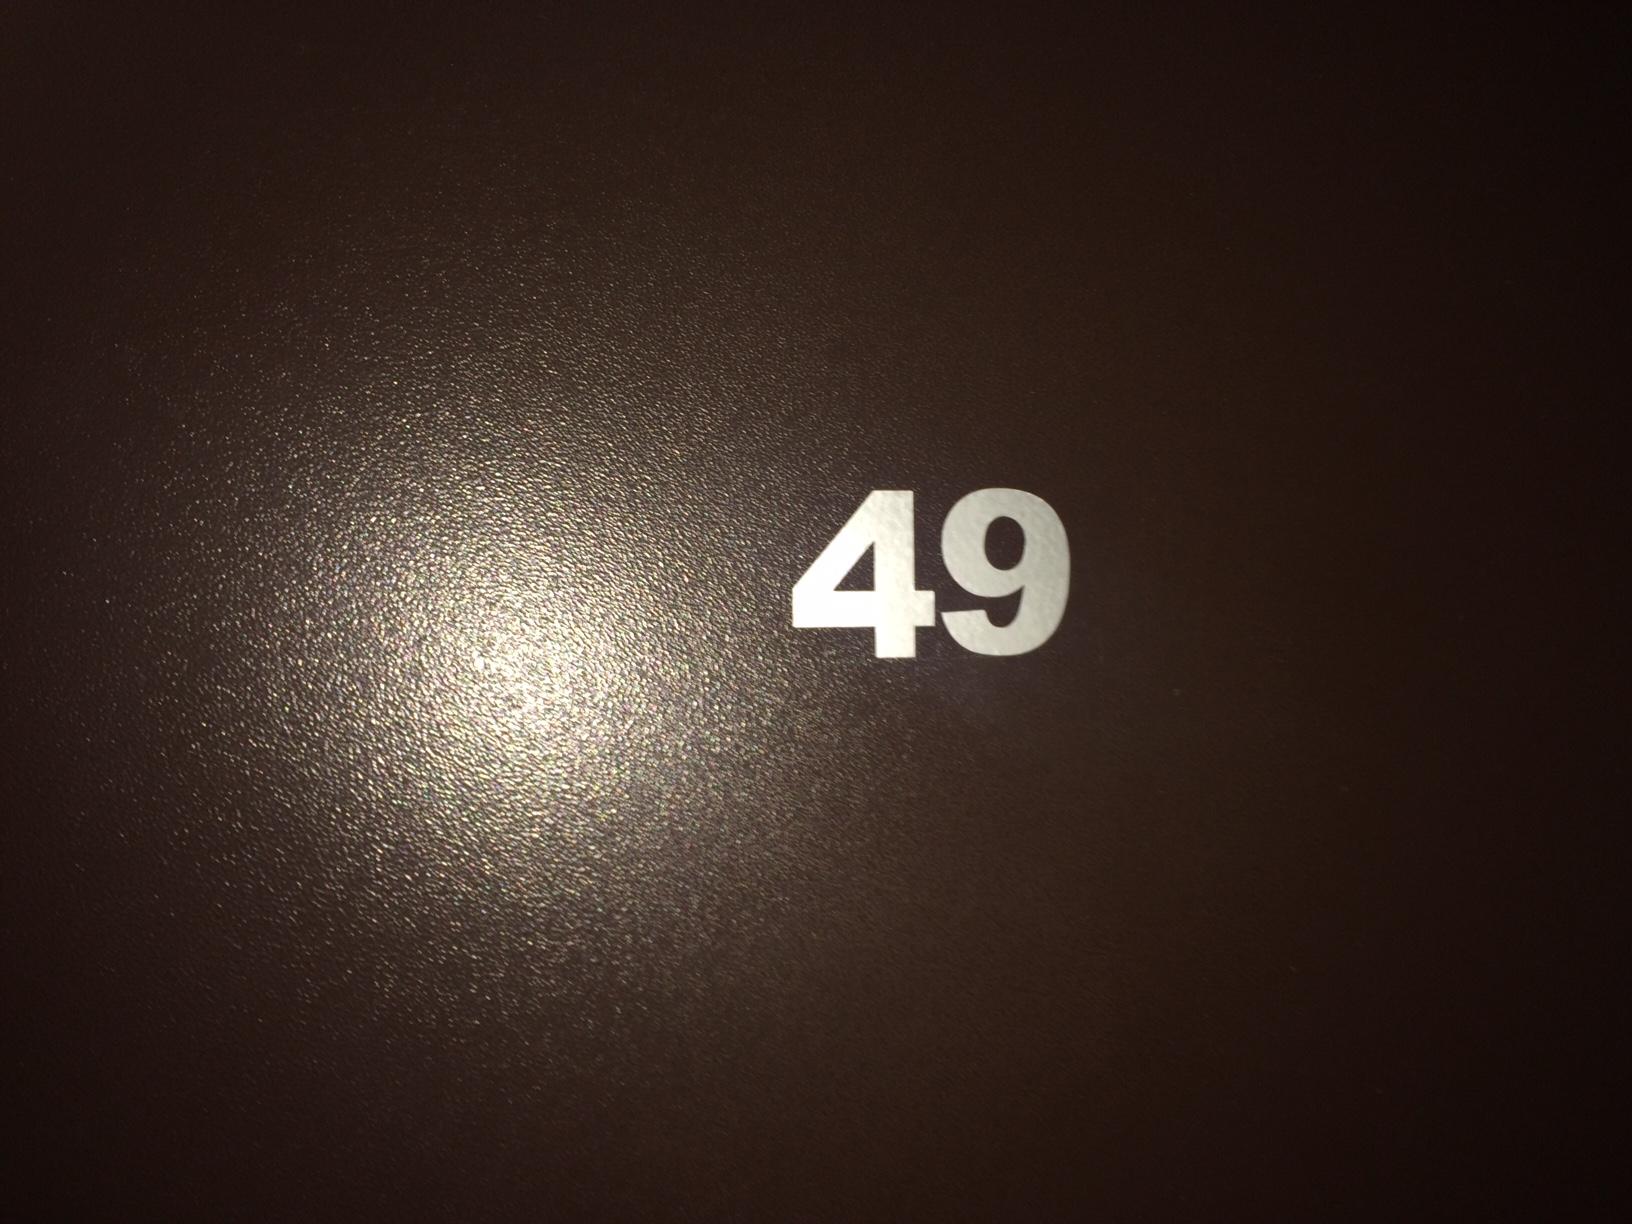 Boxa nr.49, Ansamblul Izvorul Dorului, Sinaia